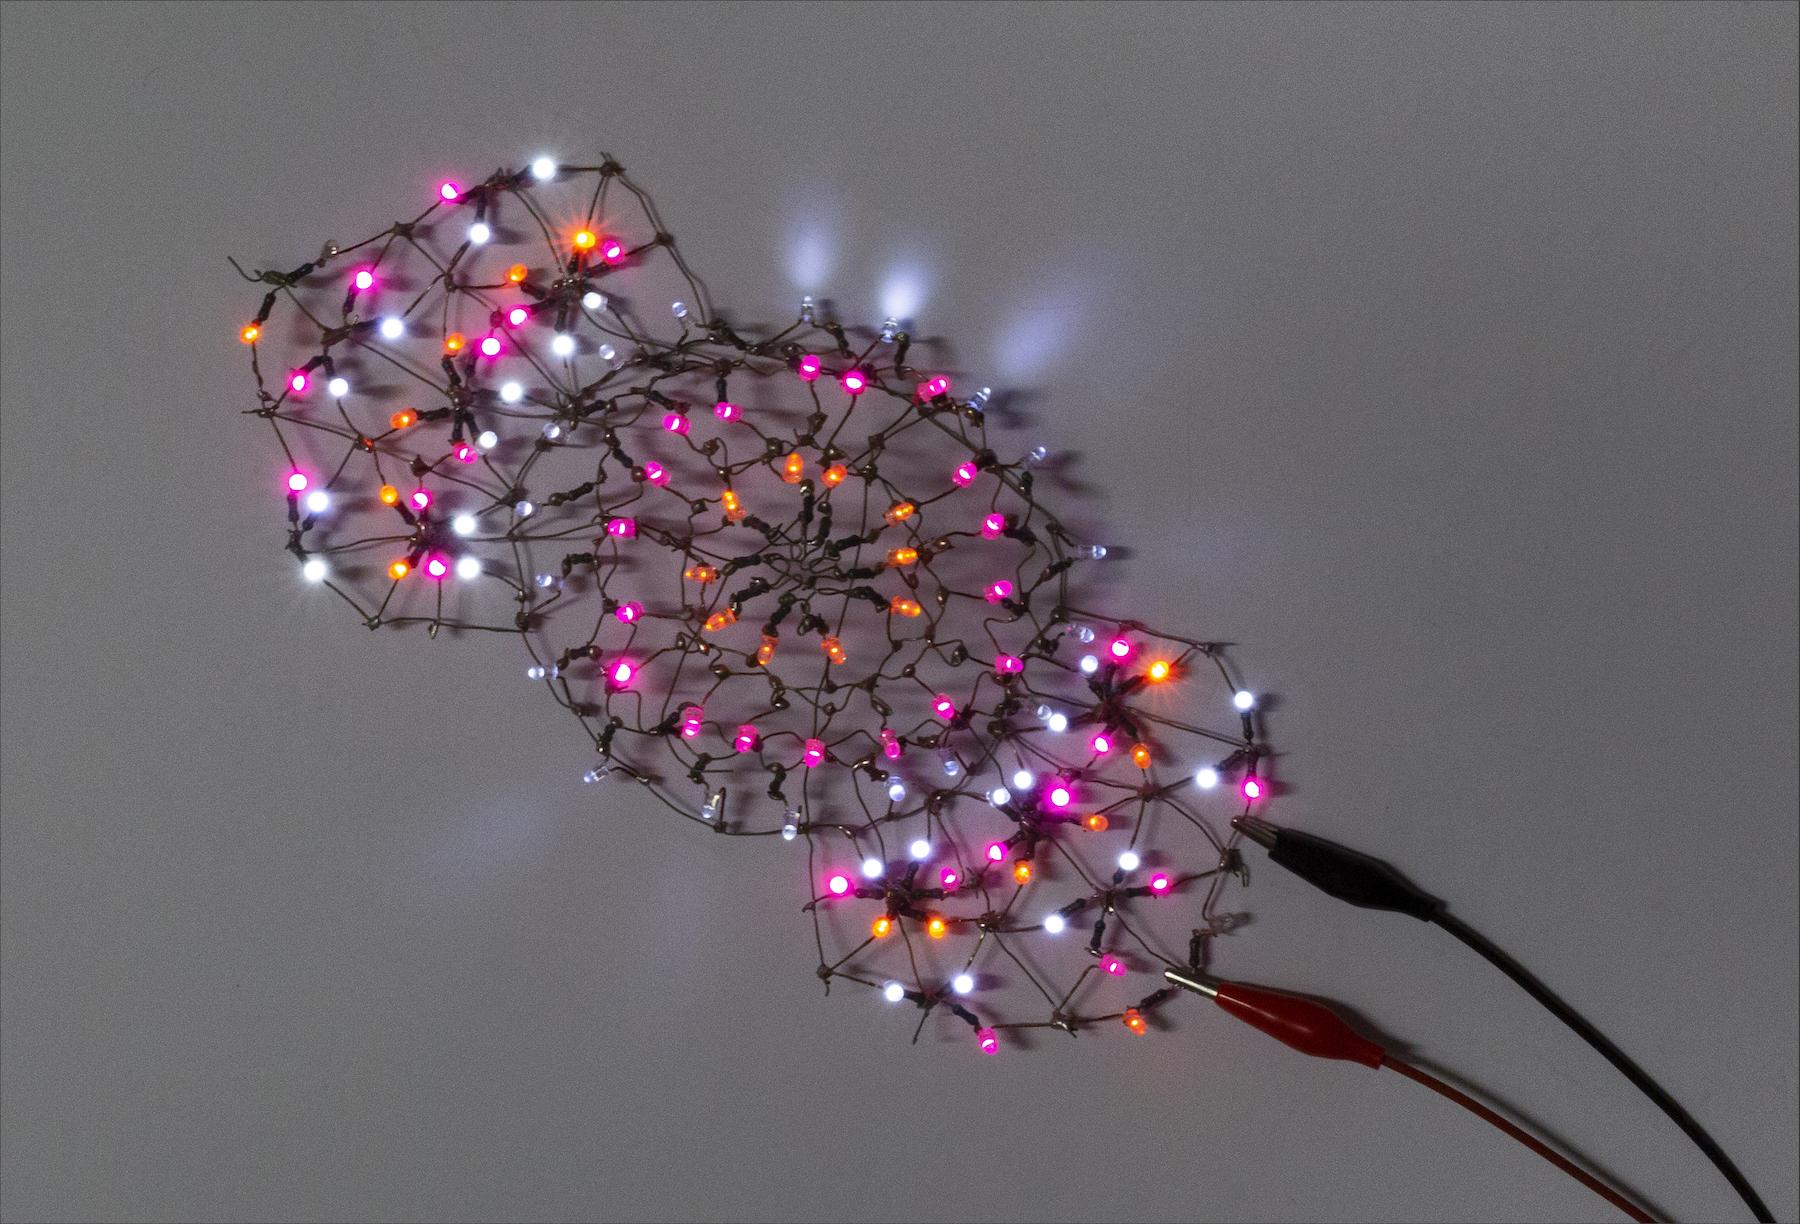 Salmanson_LighterThanAir6-View3_LED+wire_9.4x4x2.4_2014.jpg